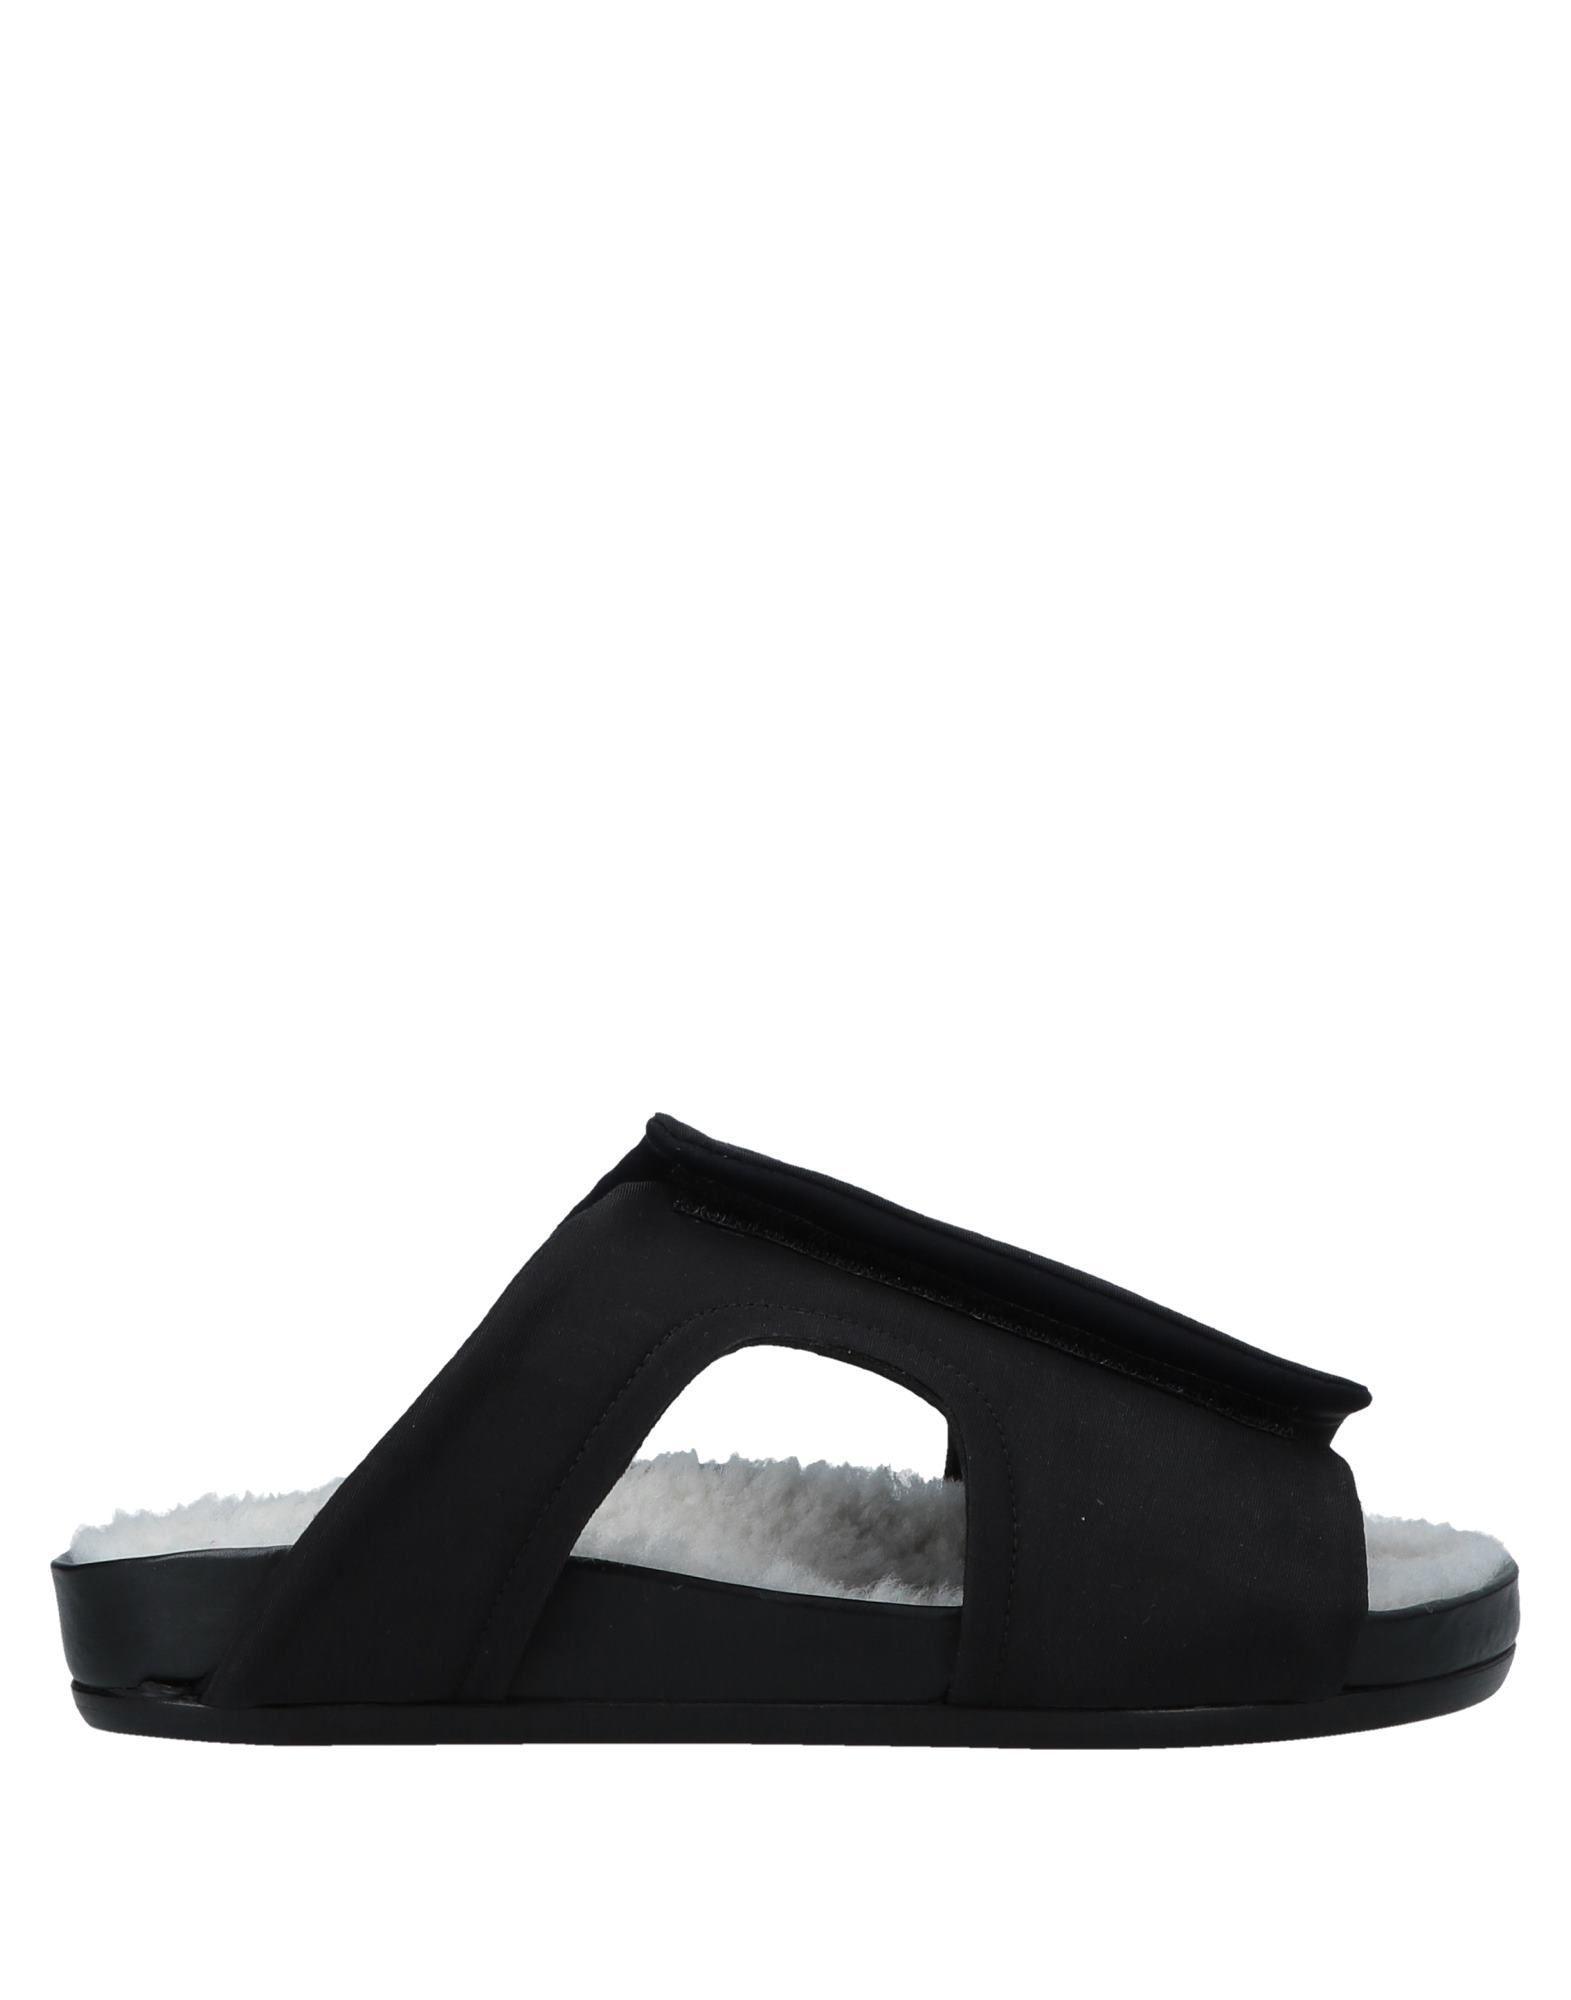 974e51d1a204b1 Lyst - Rick Owens Sandals in Black - Save 57%